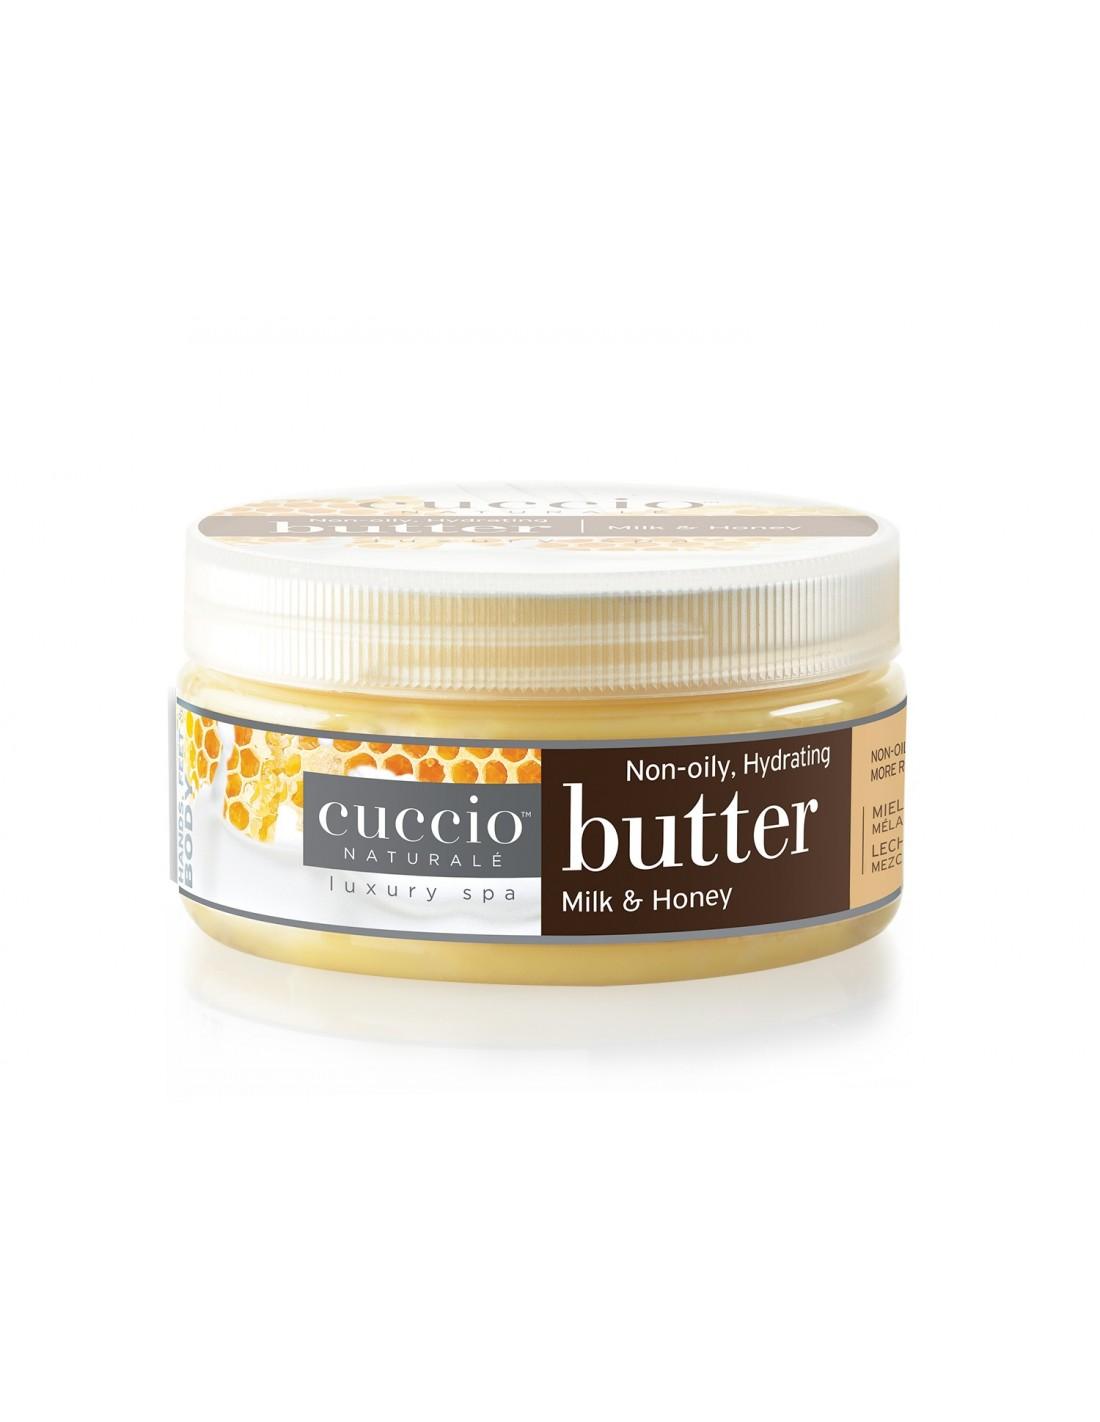 Hidratante Cuccio -  Butter Blend - Milk and Honey - 42g - CNSC1002